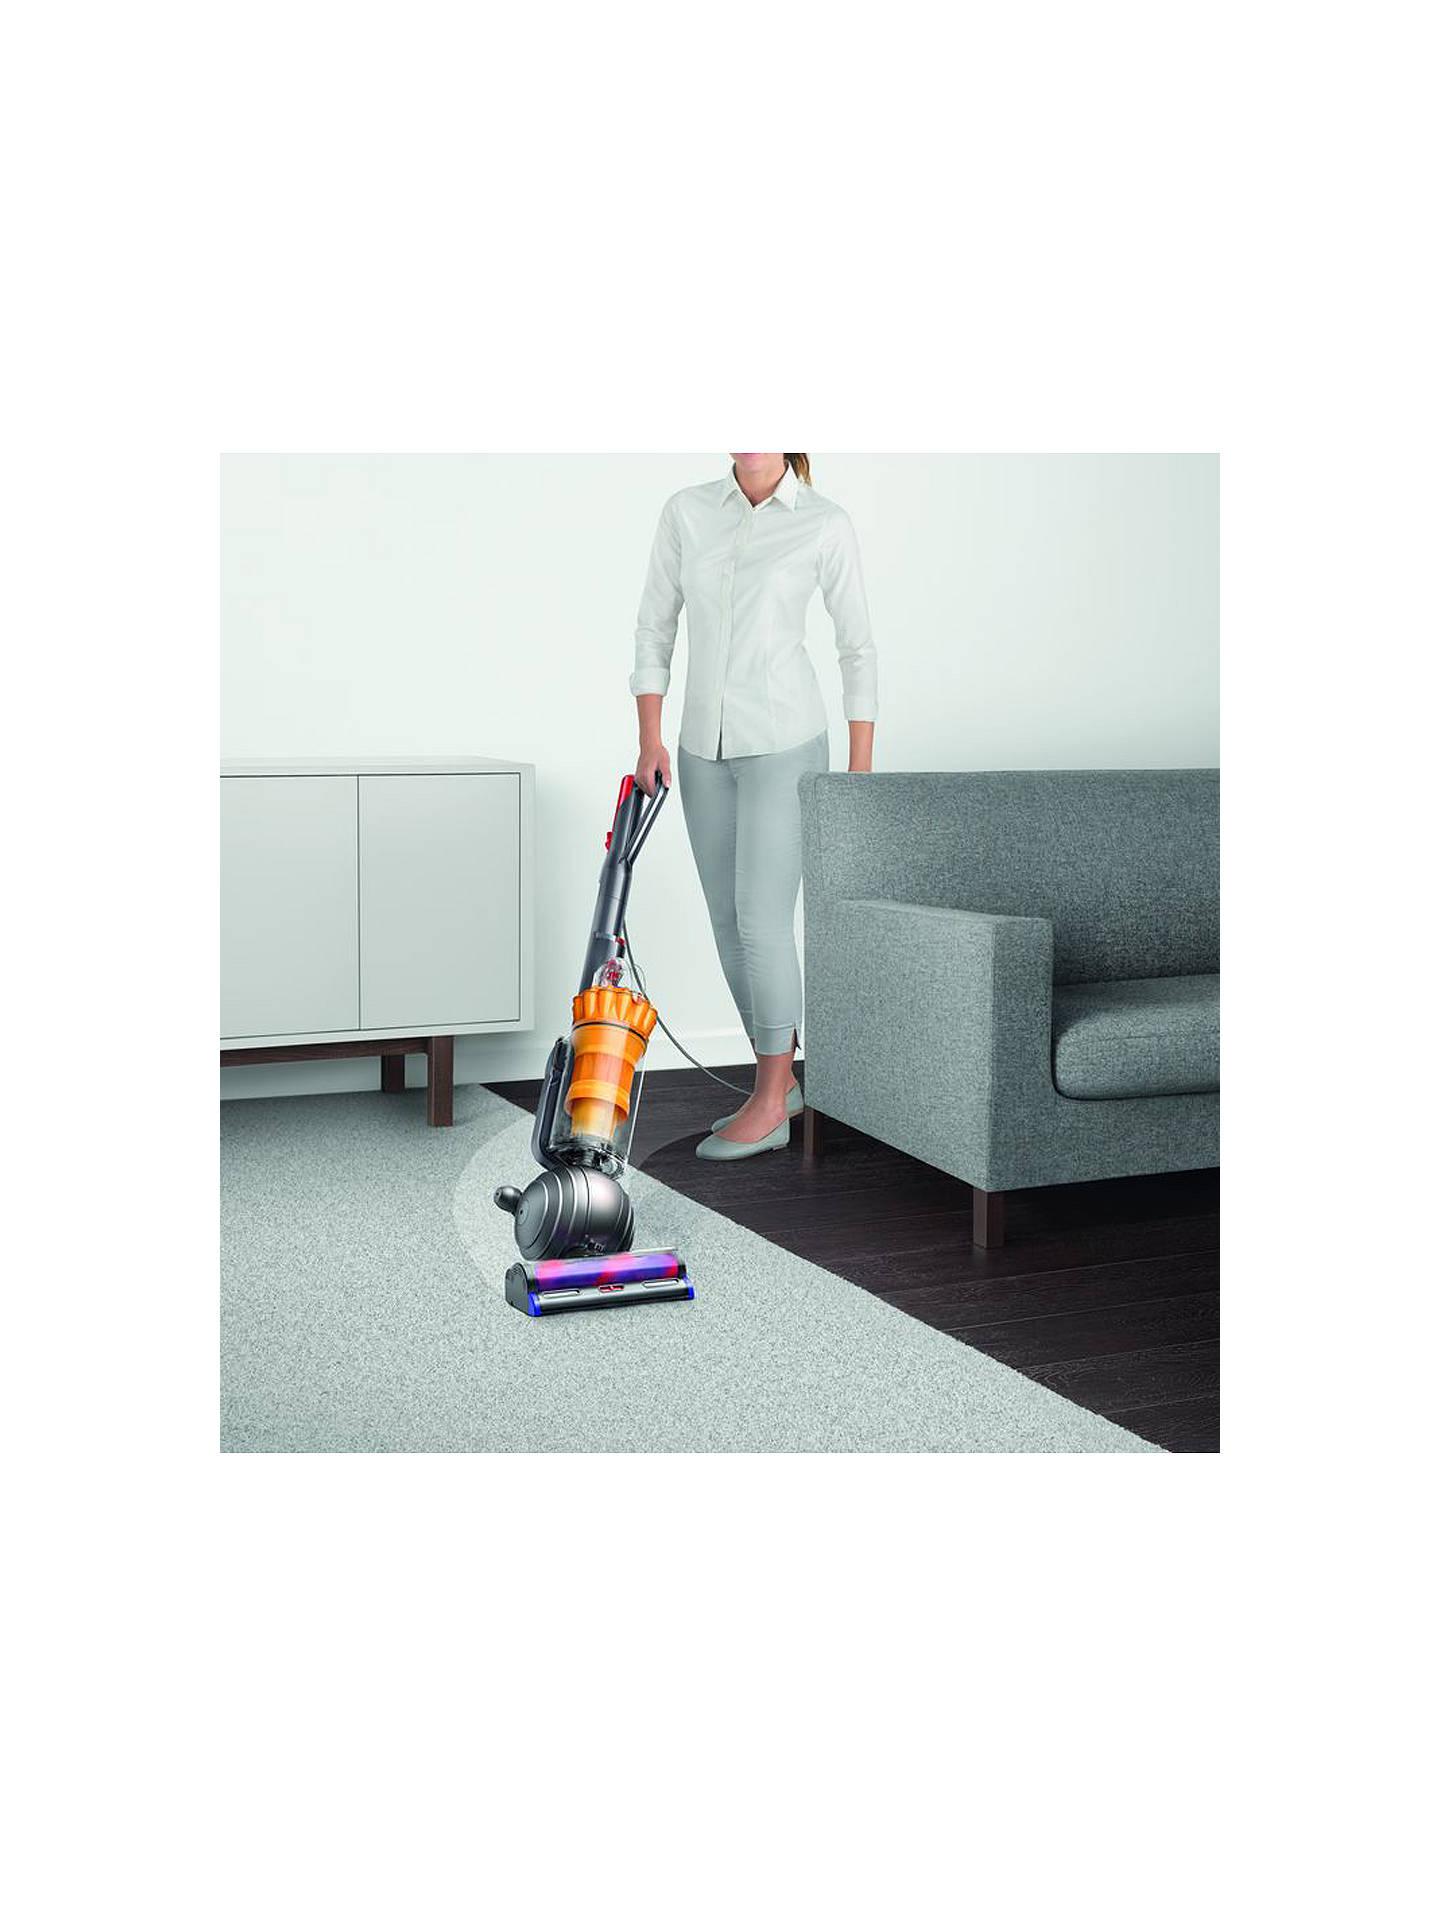 Dyson Light Ball Multi Floor Upright Vacuum Cleaner At Johnlewis Com